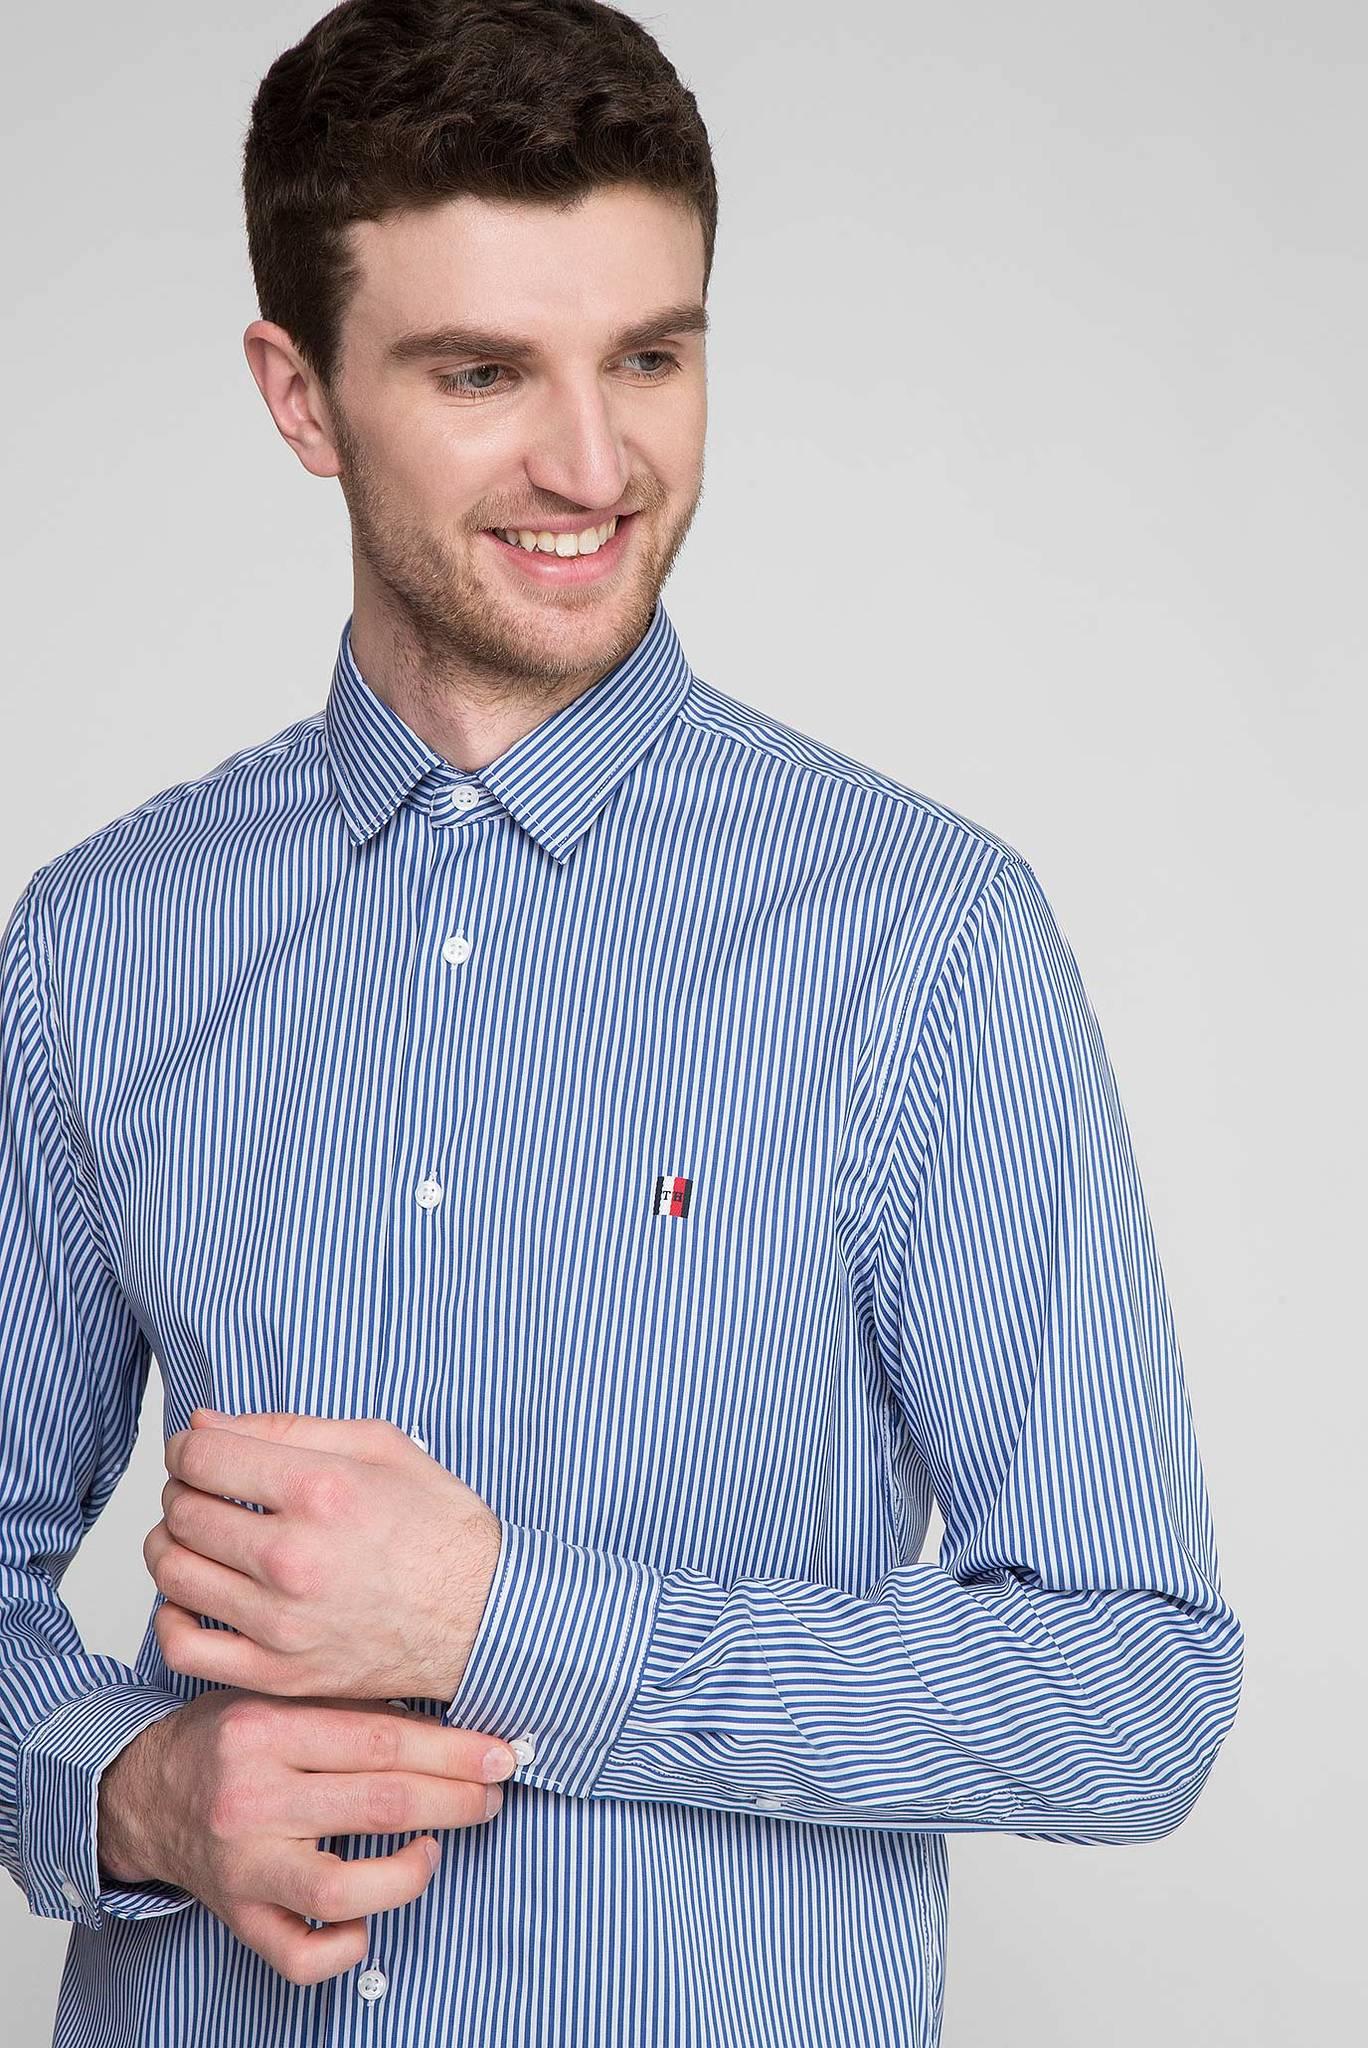 Мужская синяя рубашка в полоску MODERN ESSENTIAL STRIPED Tommy Hilfiger